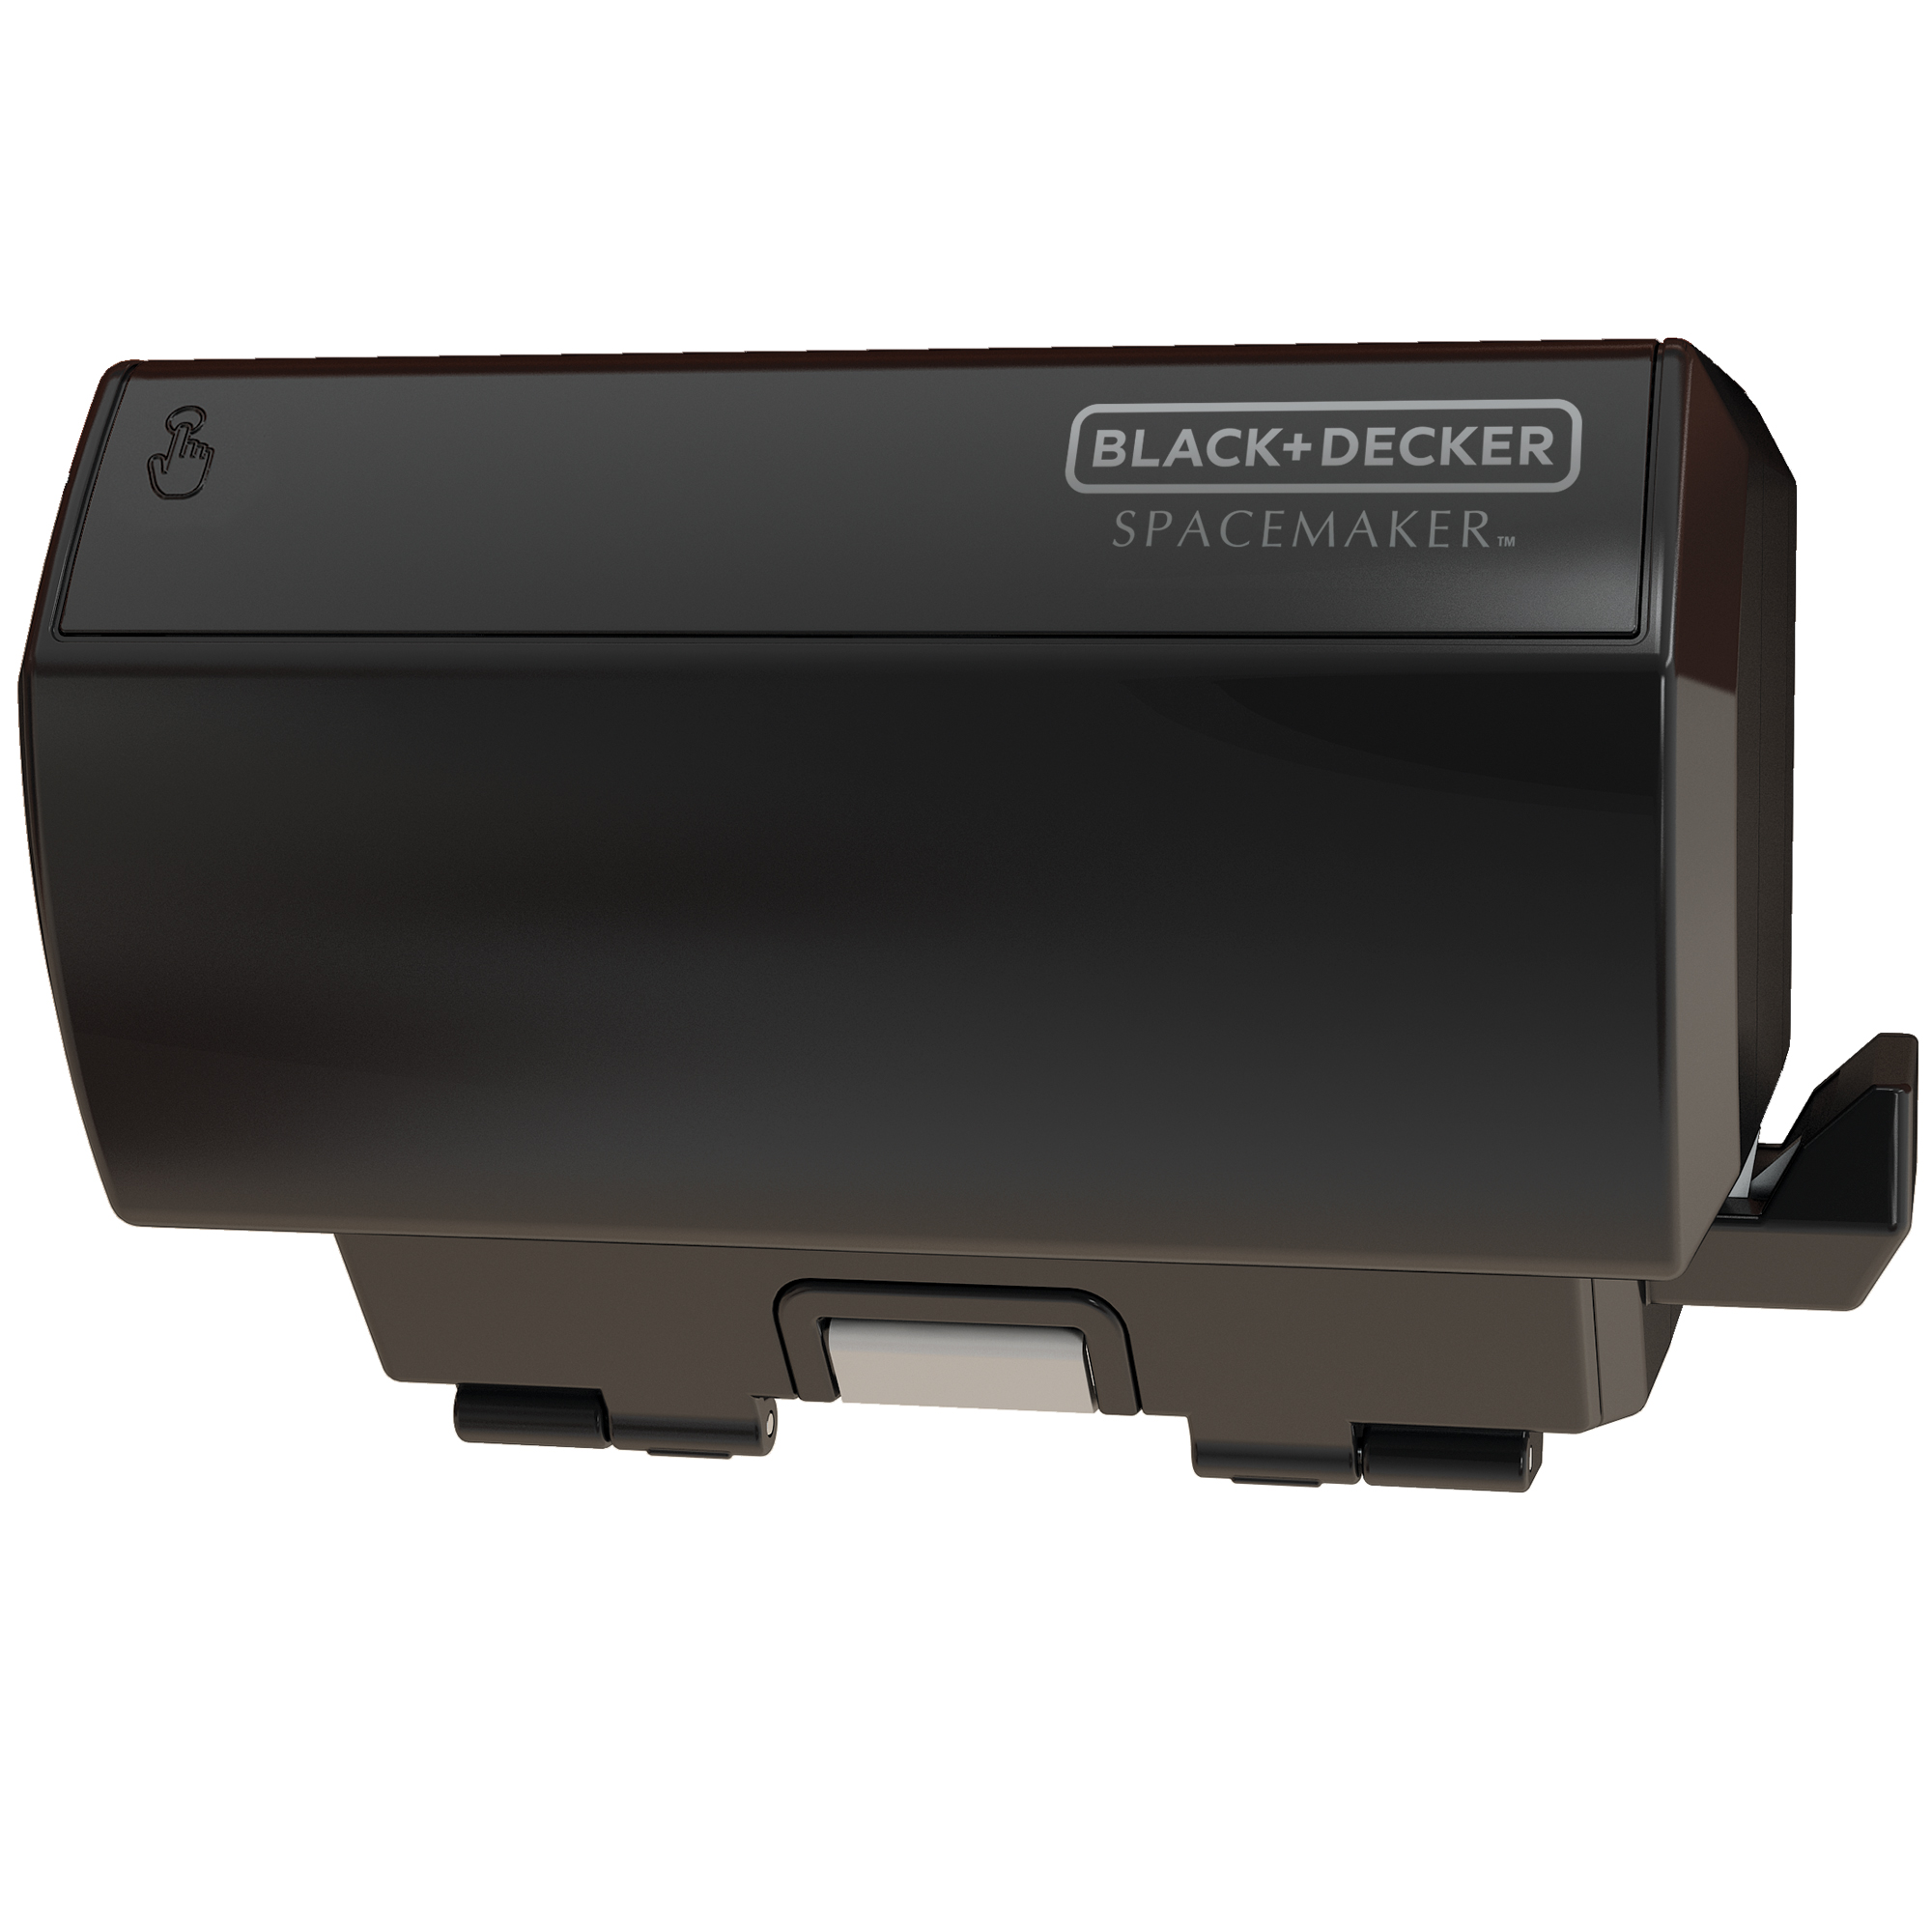 Black & Decker SpaceMaker Multipurpose Can Opener, Black, CO100B by BLACK DECKER